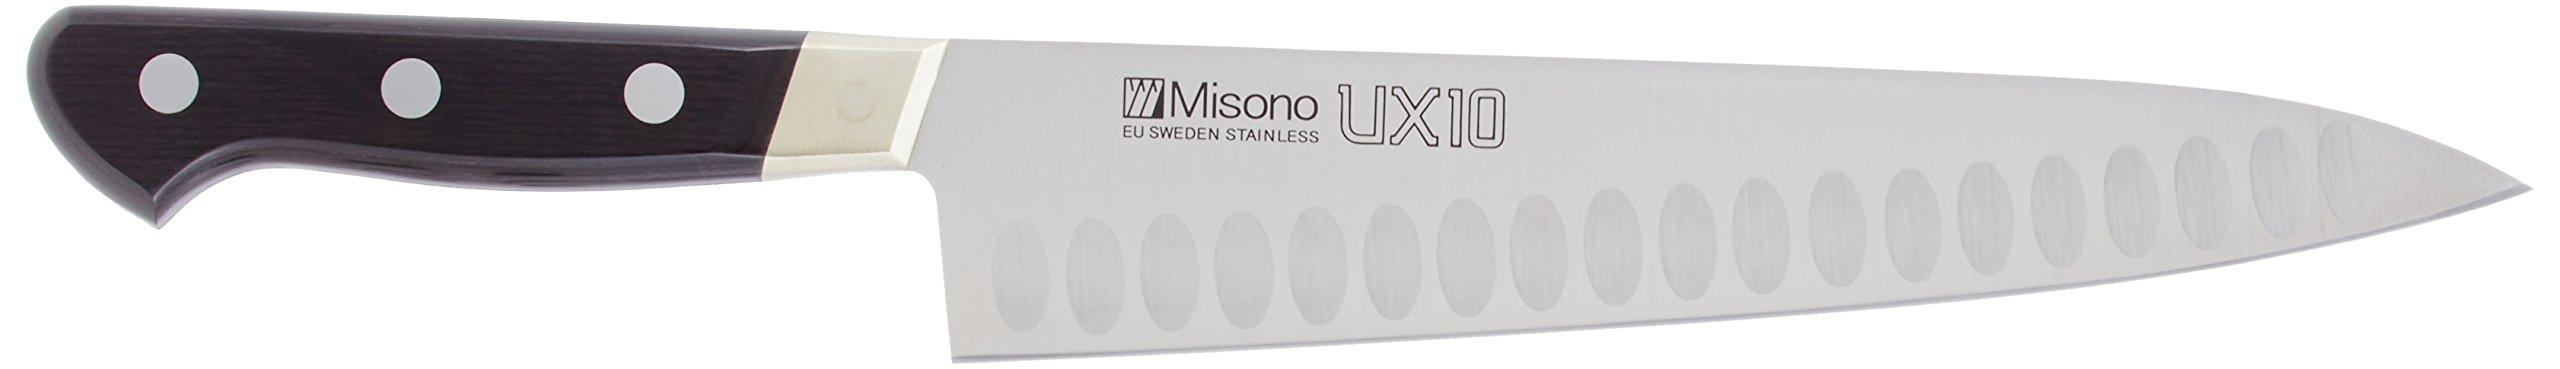 Misono UX10 series Gyuto salmon No.762 / 21cm